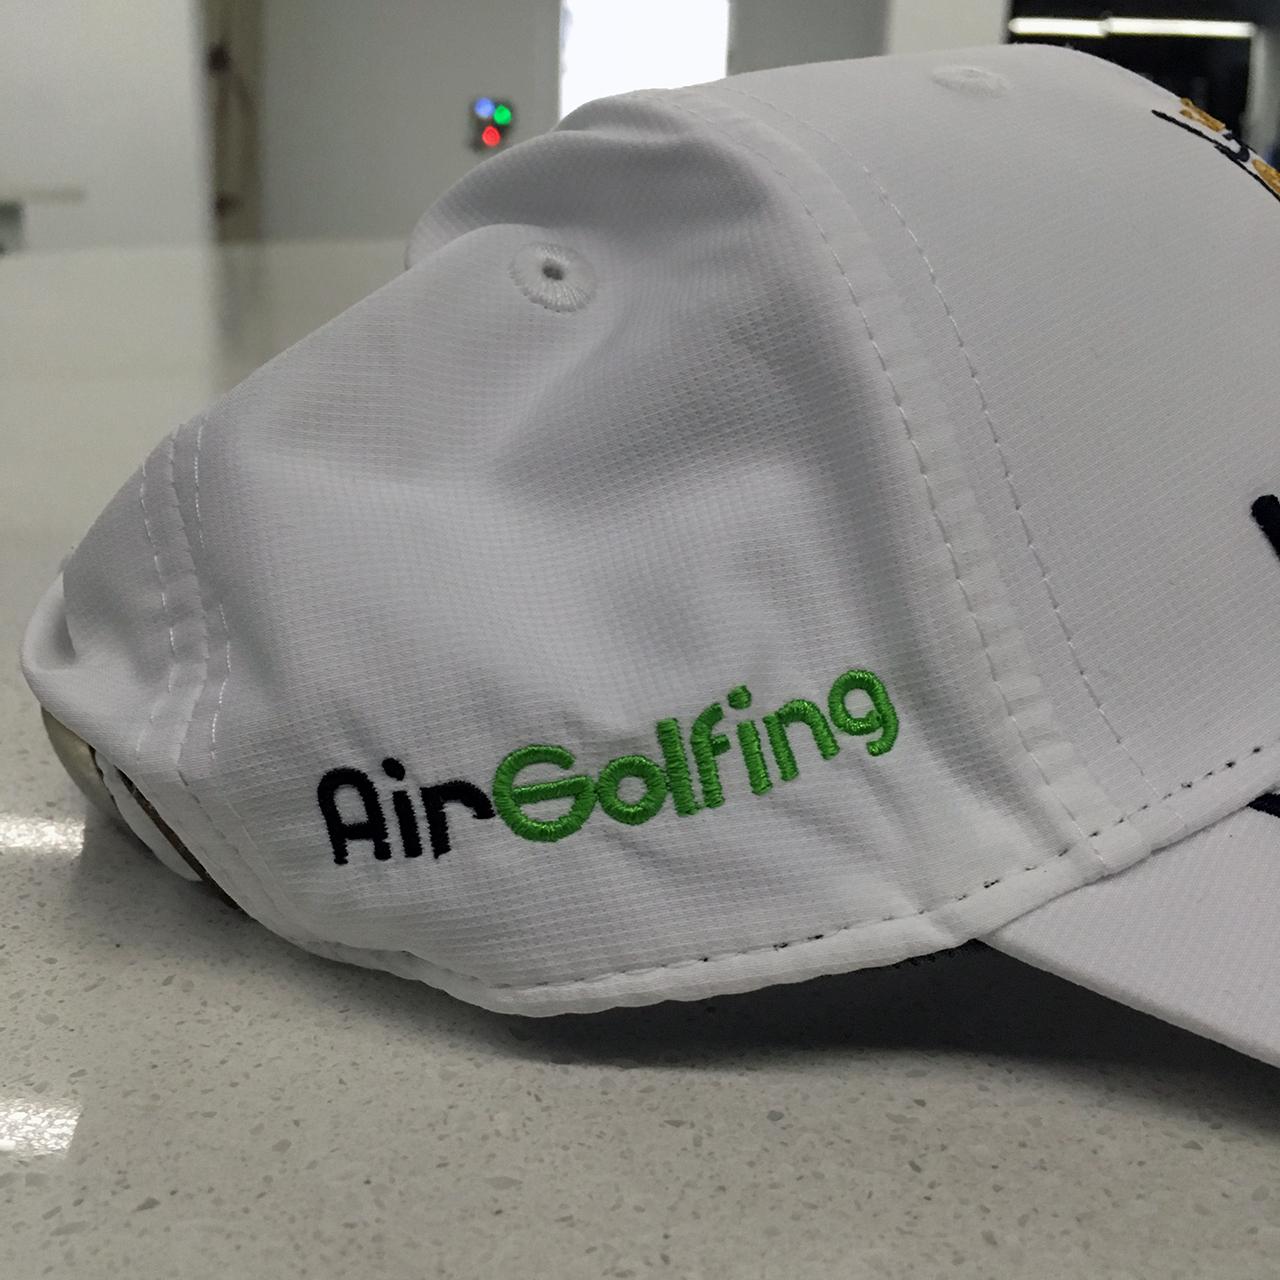 airgolfing-heat